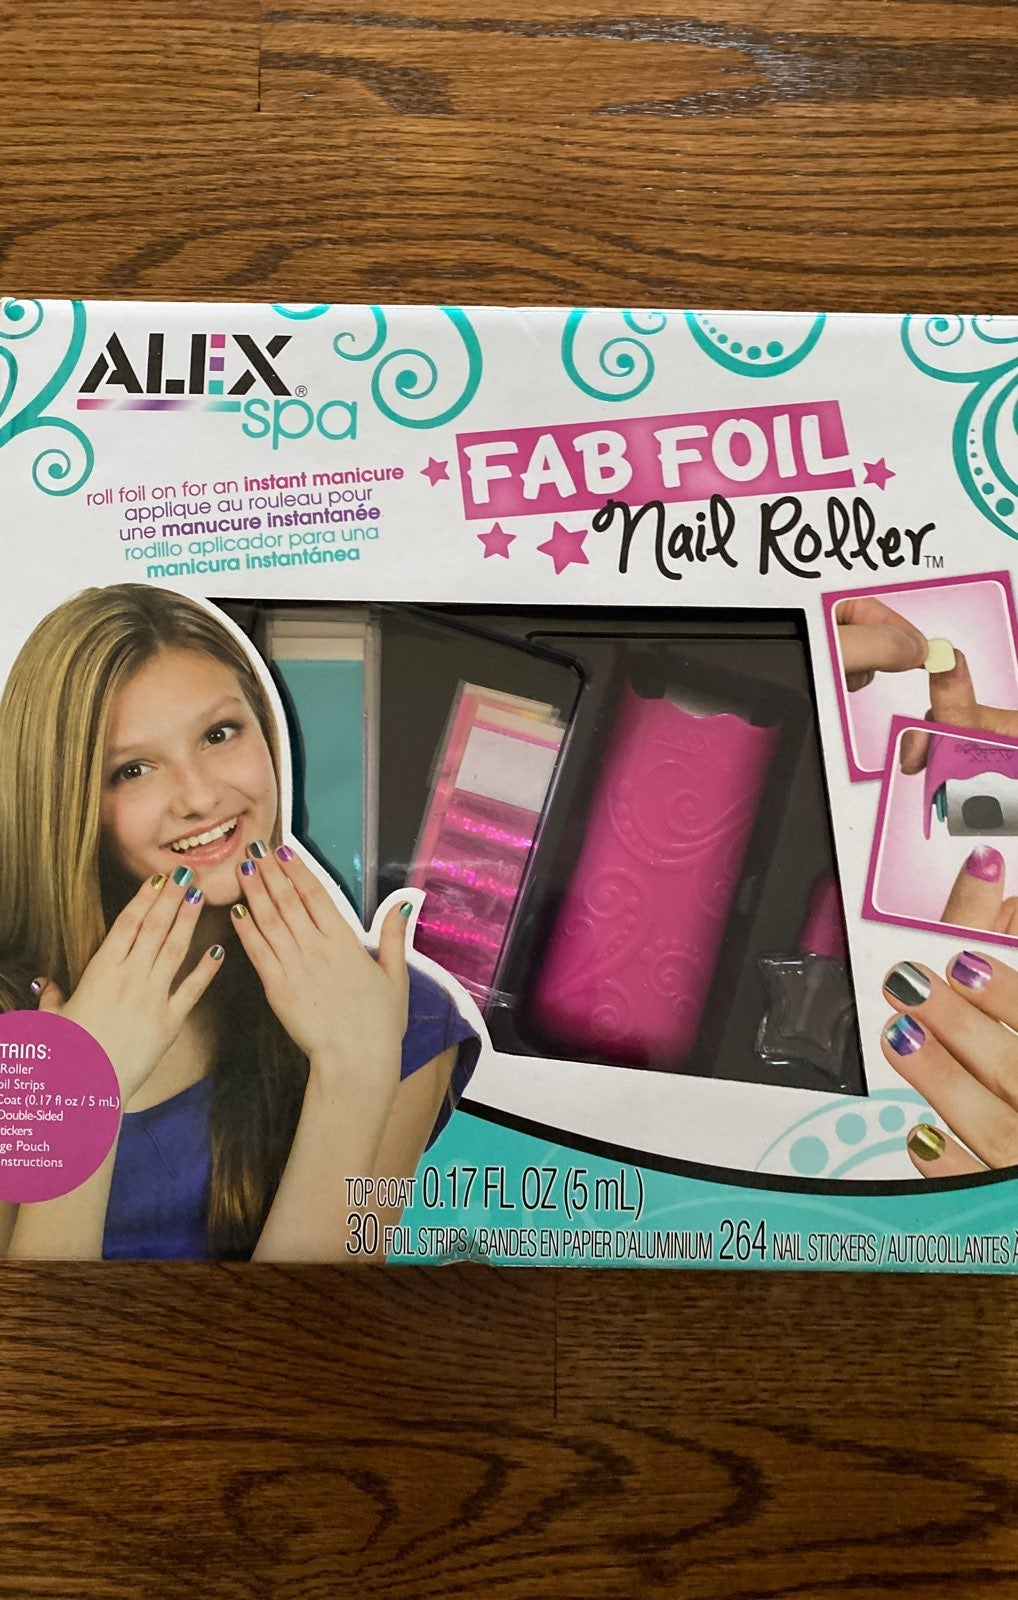 Alex spa foil nail roller nail art